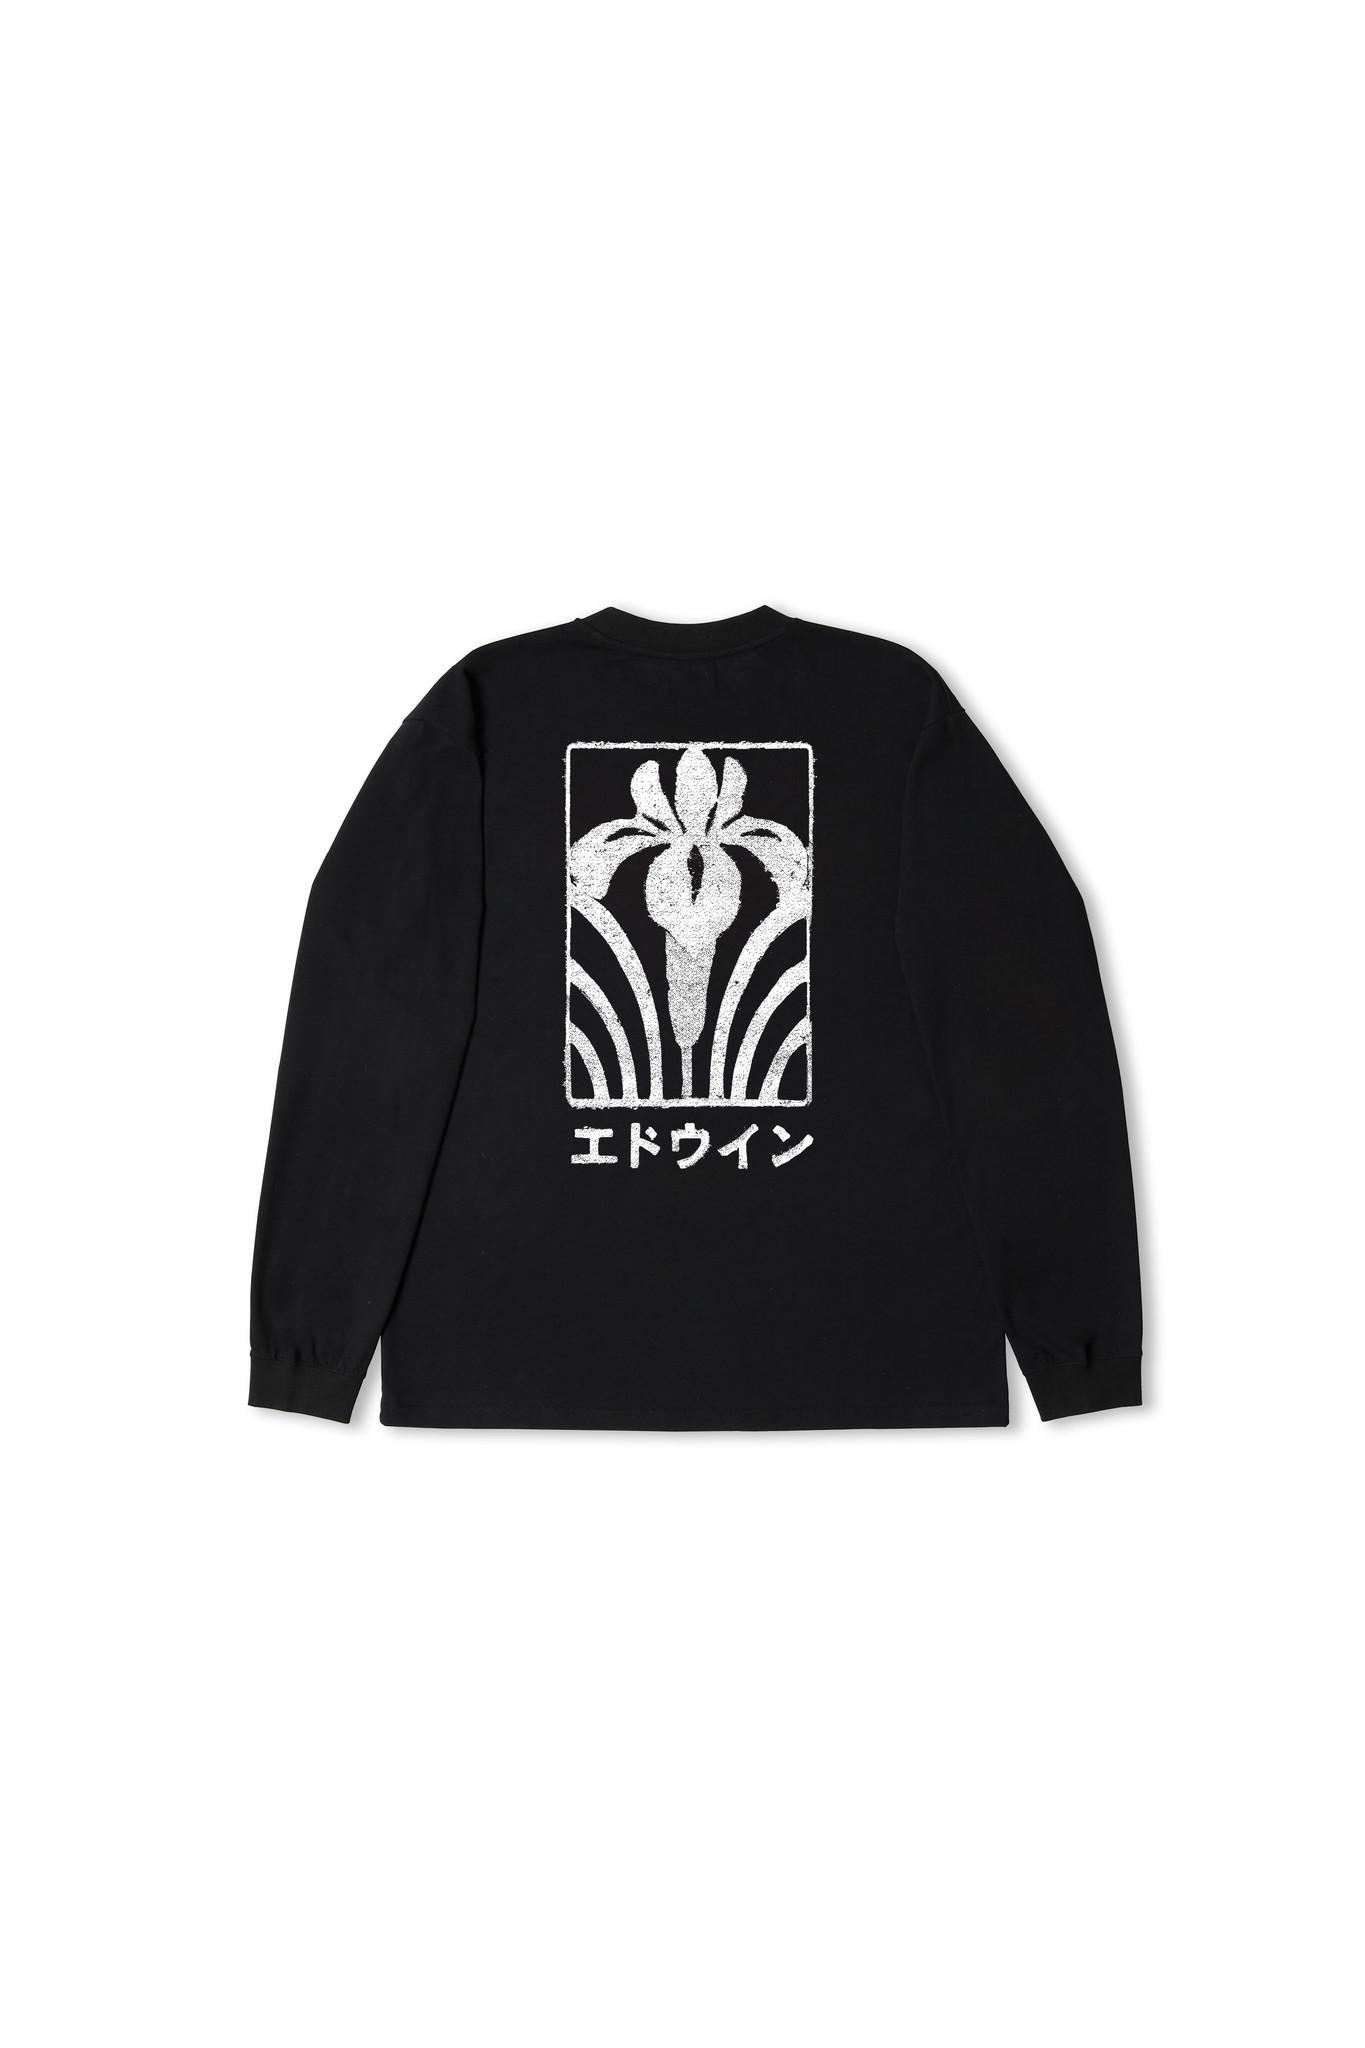 Hanani Longsleeve T-shirt Black-2